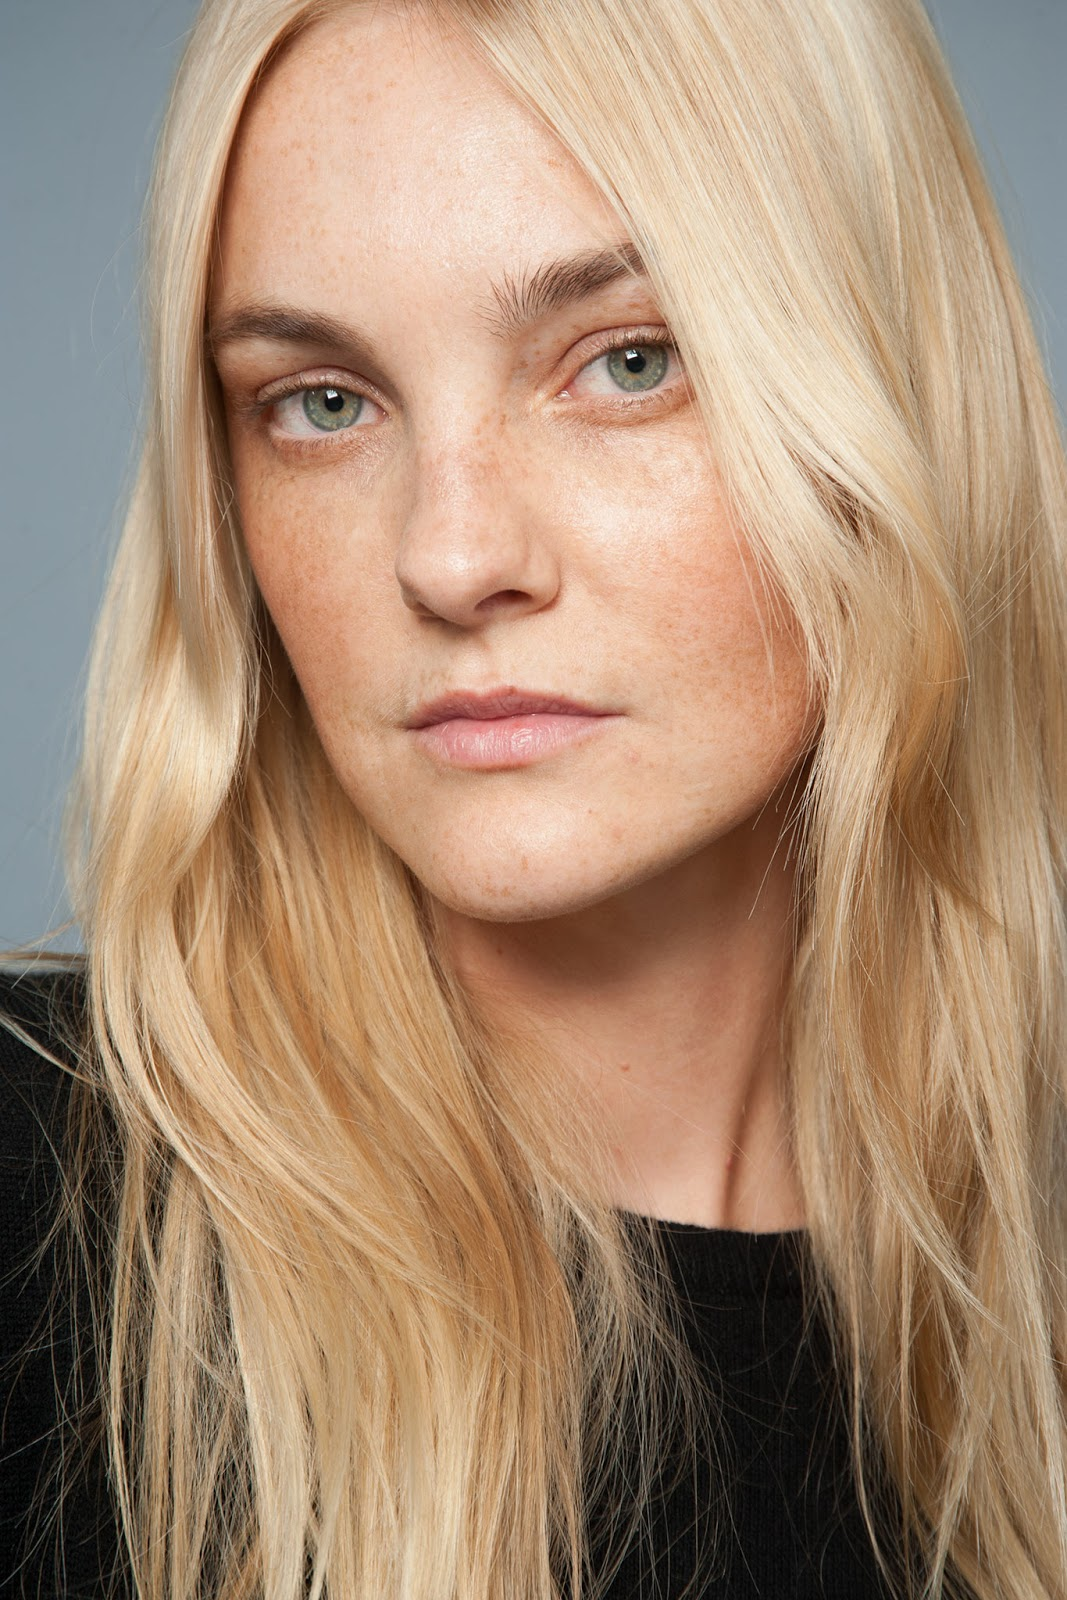 Make-up & beauty trends Fall/Winter 2015 / natural no-makeup looks at Topshop, Boss, Gucci, Isabel Marant, Ralph Lauren, Chloe / via fashioned by love, british fashion blog